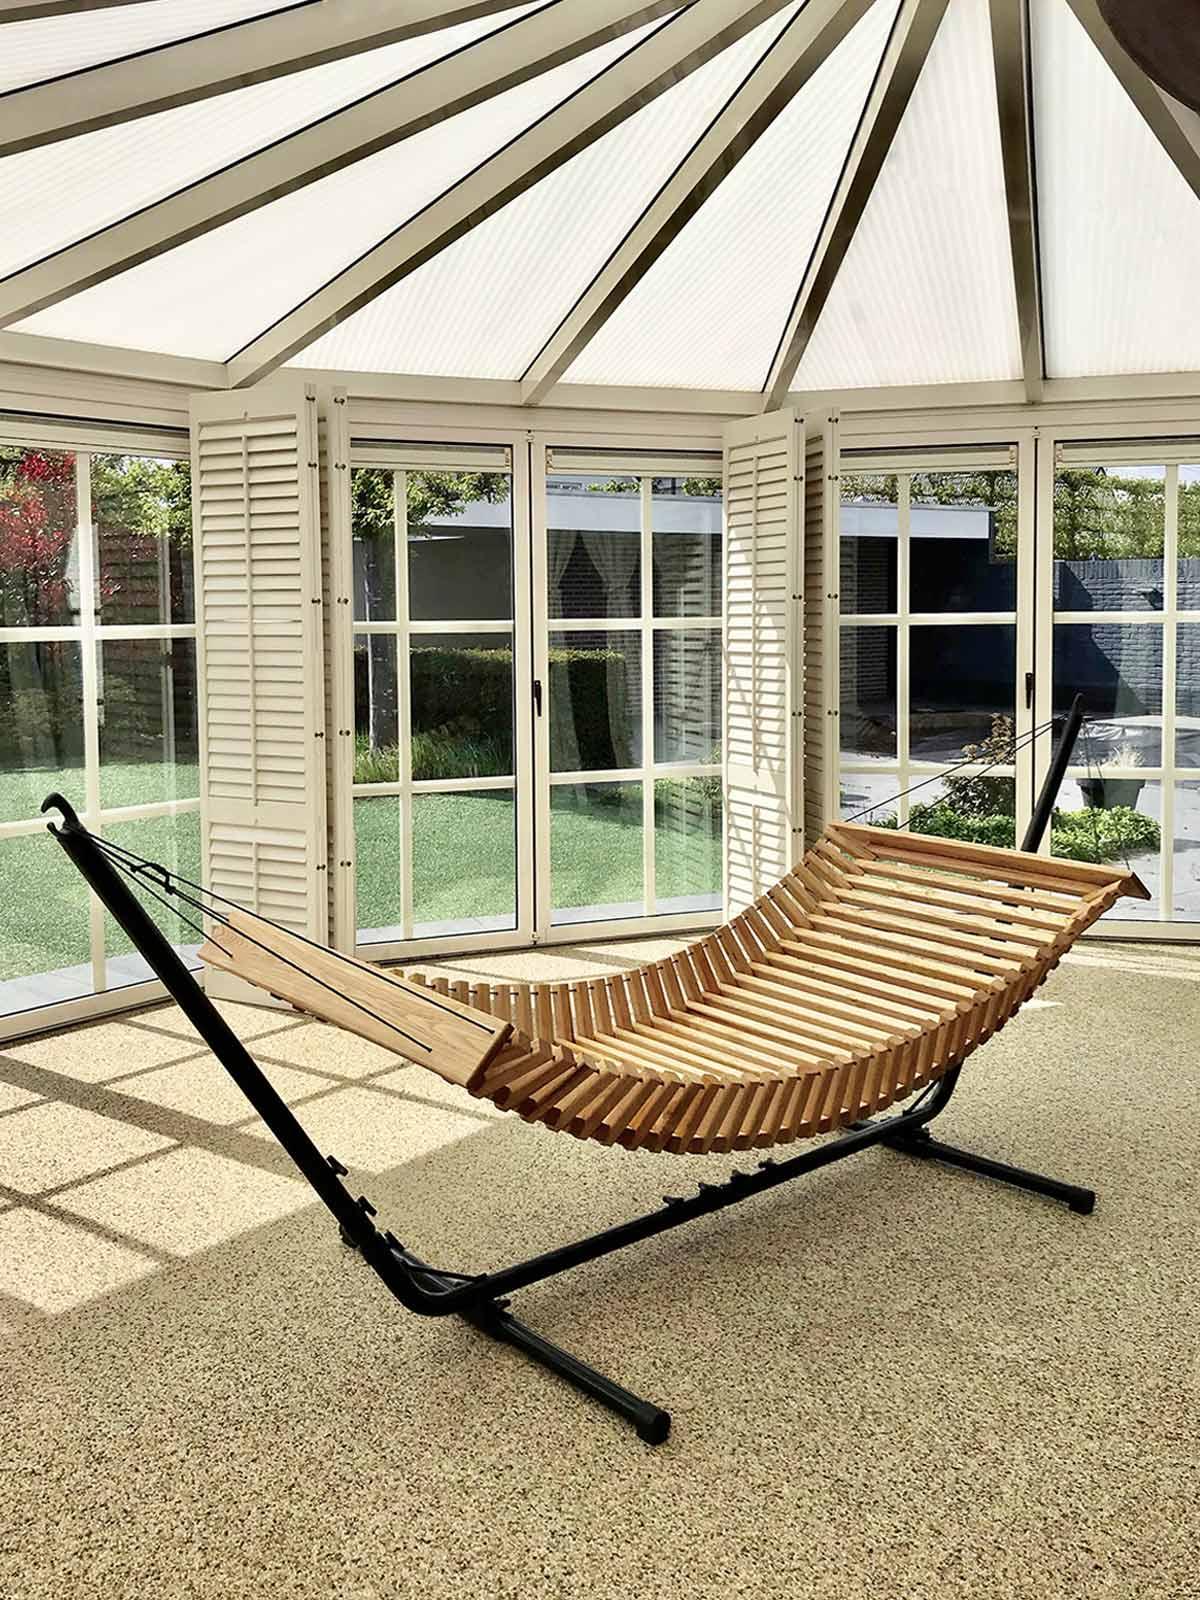 FabsFurniture-Wooden-Hammock-Eindhoven-garden-patio